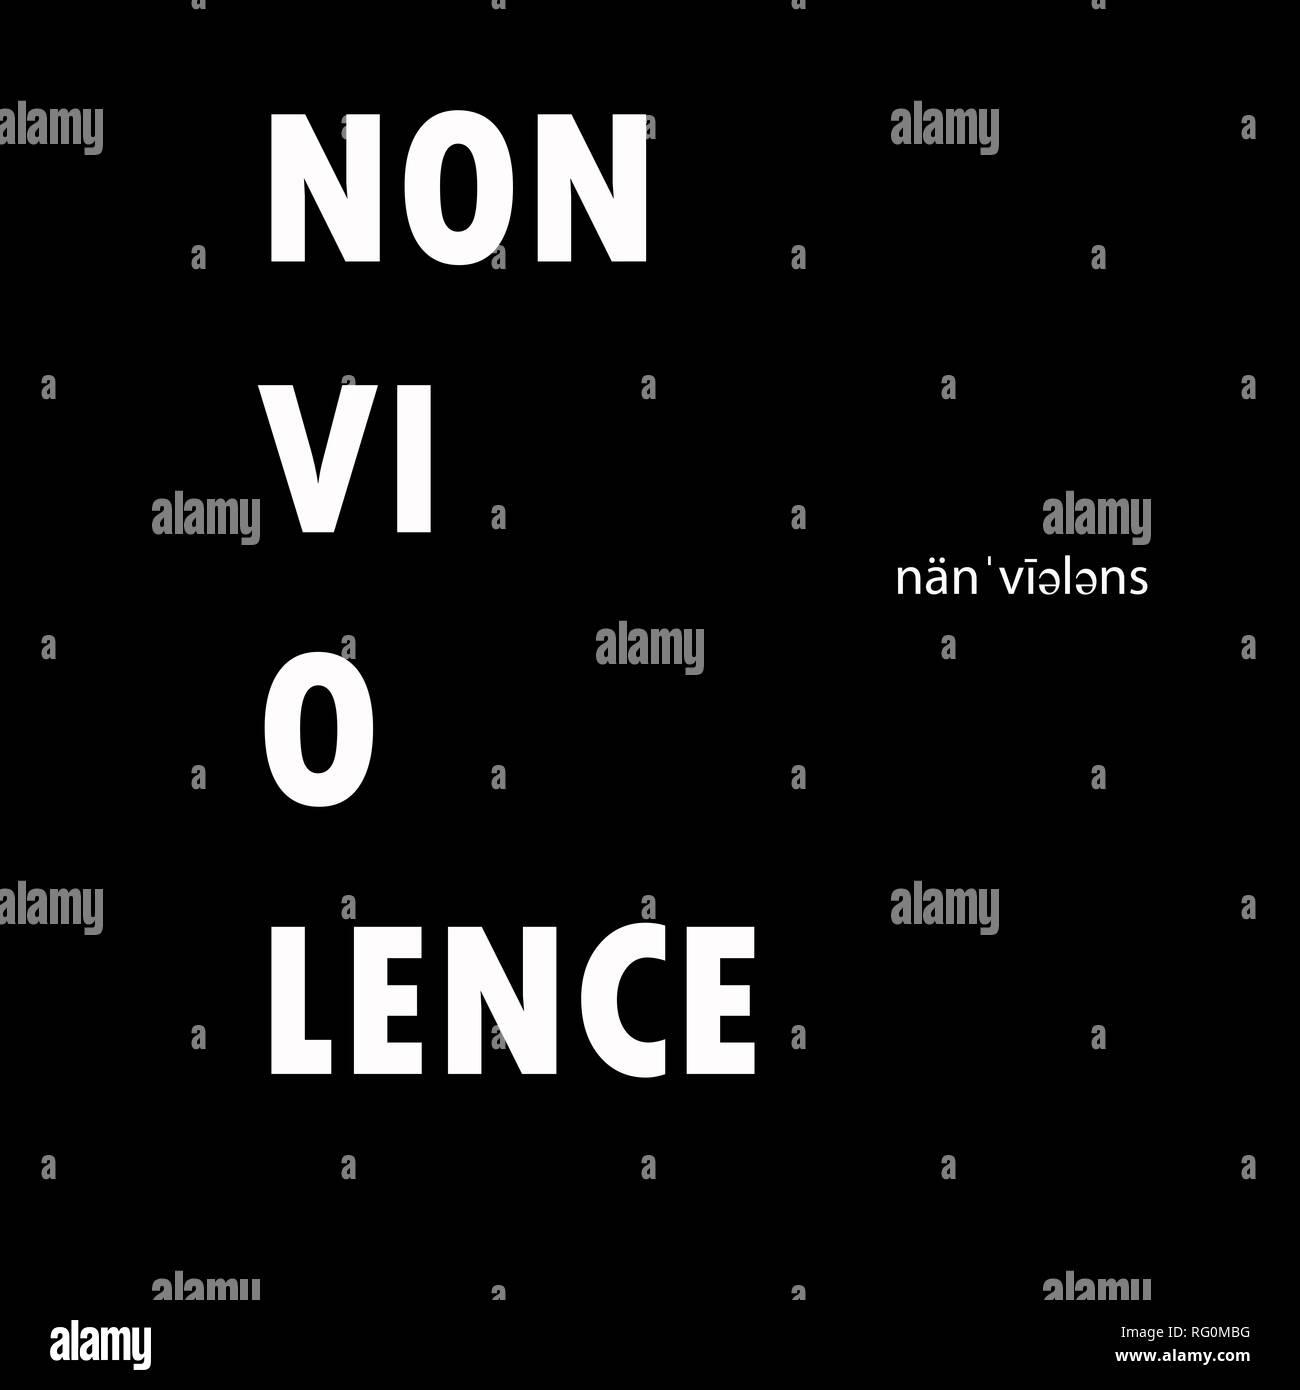 nonviolence.jpg - RG0MBG  - Stock Image